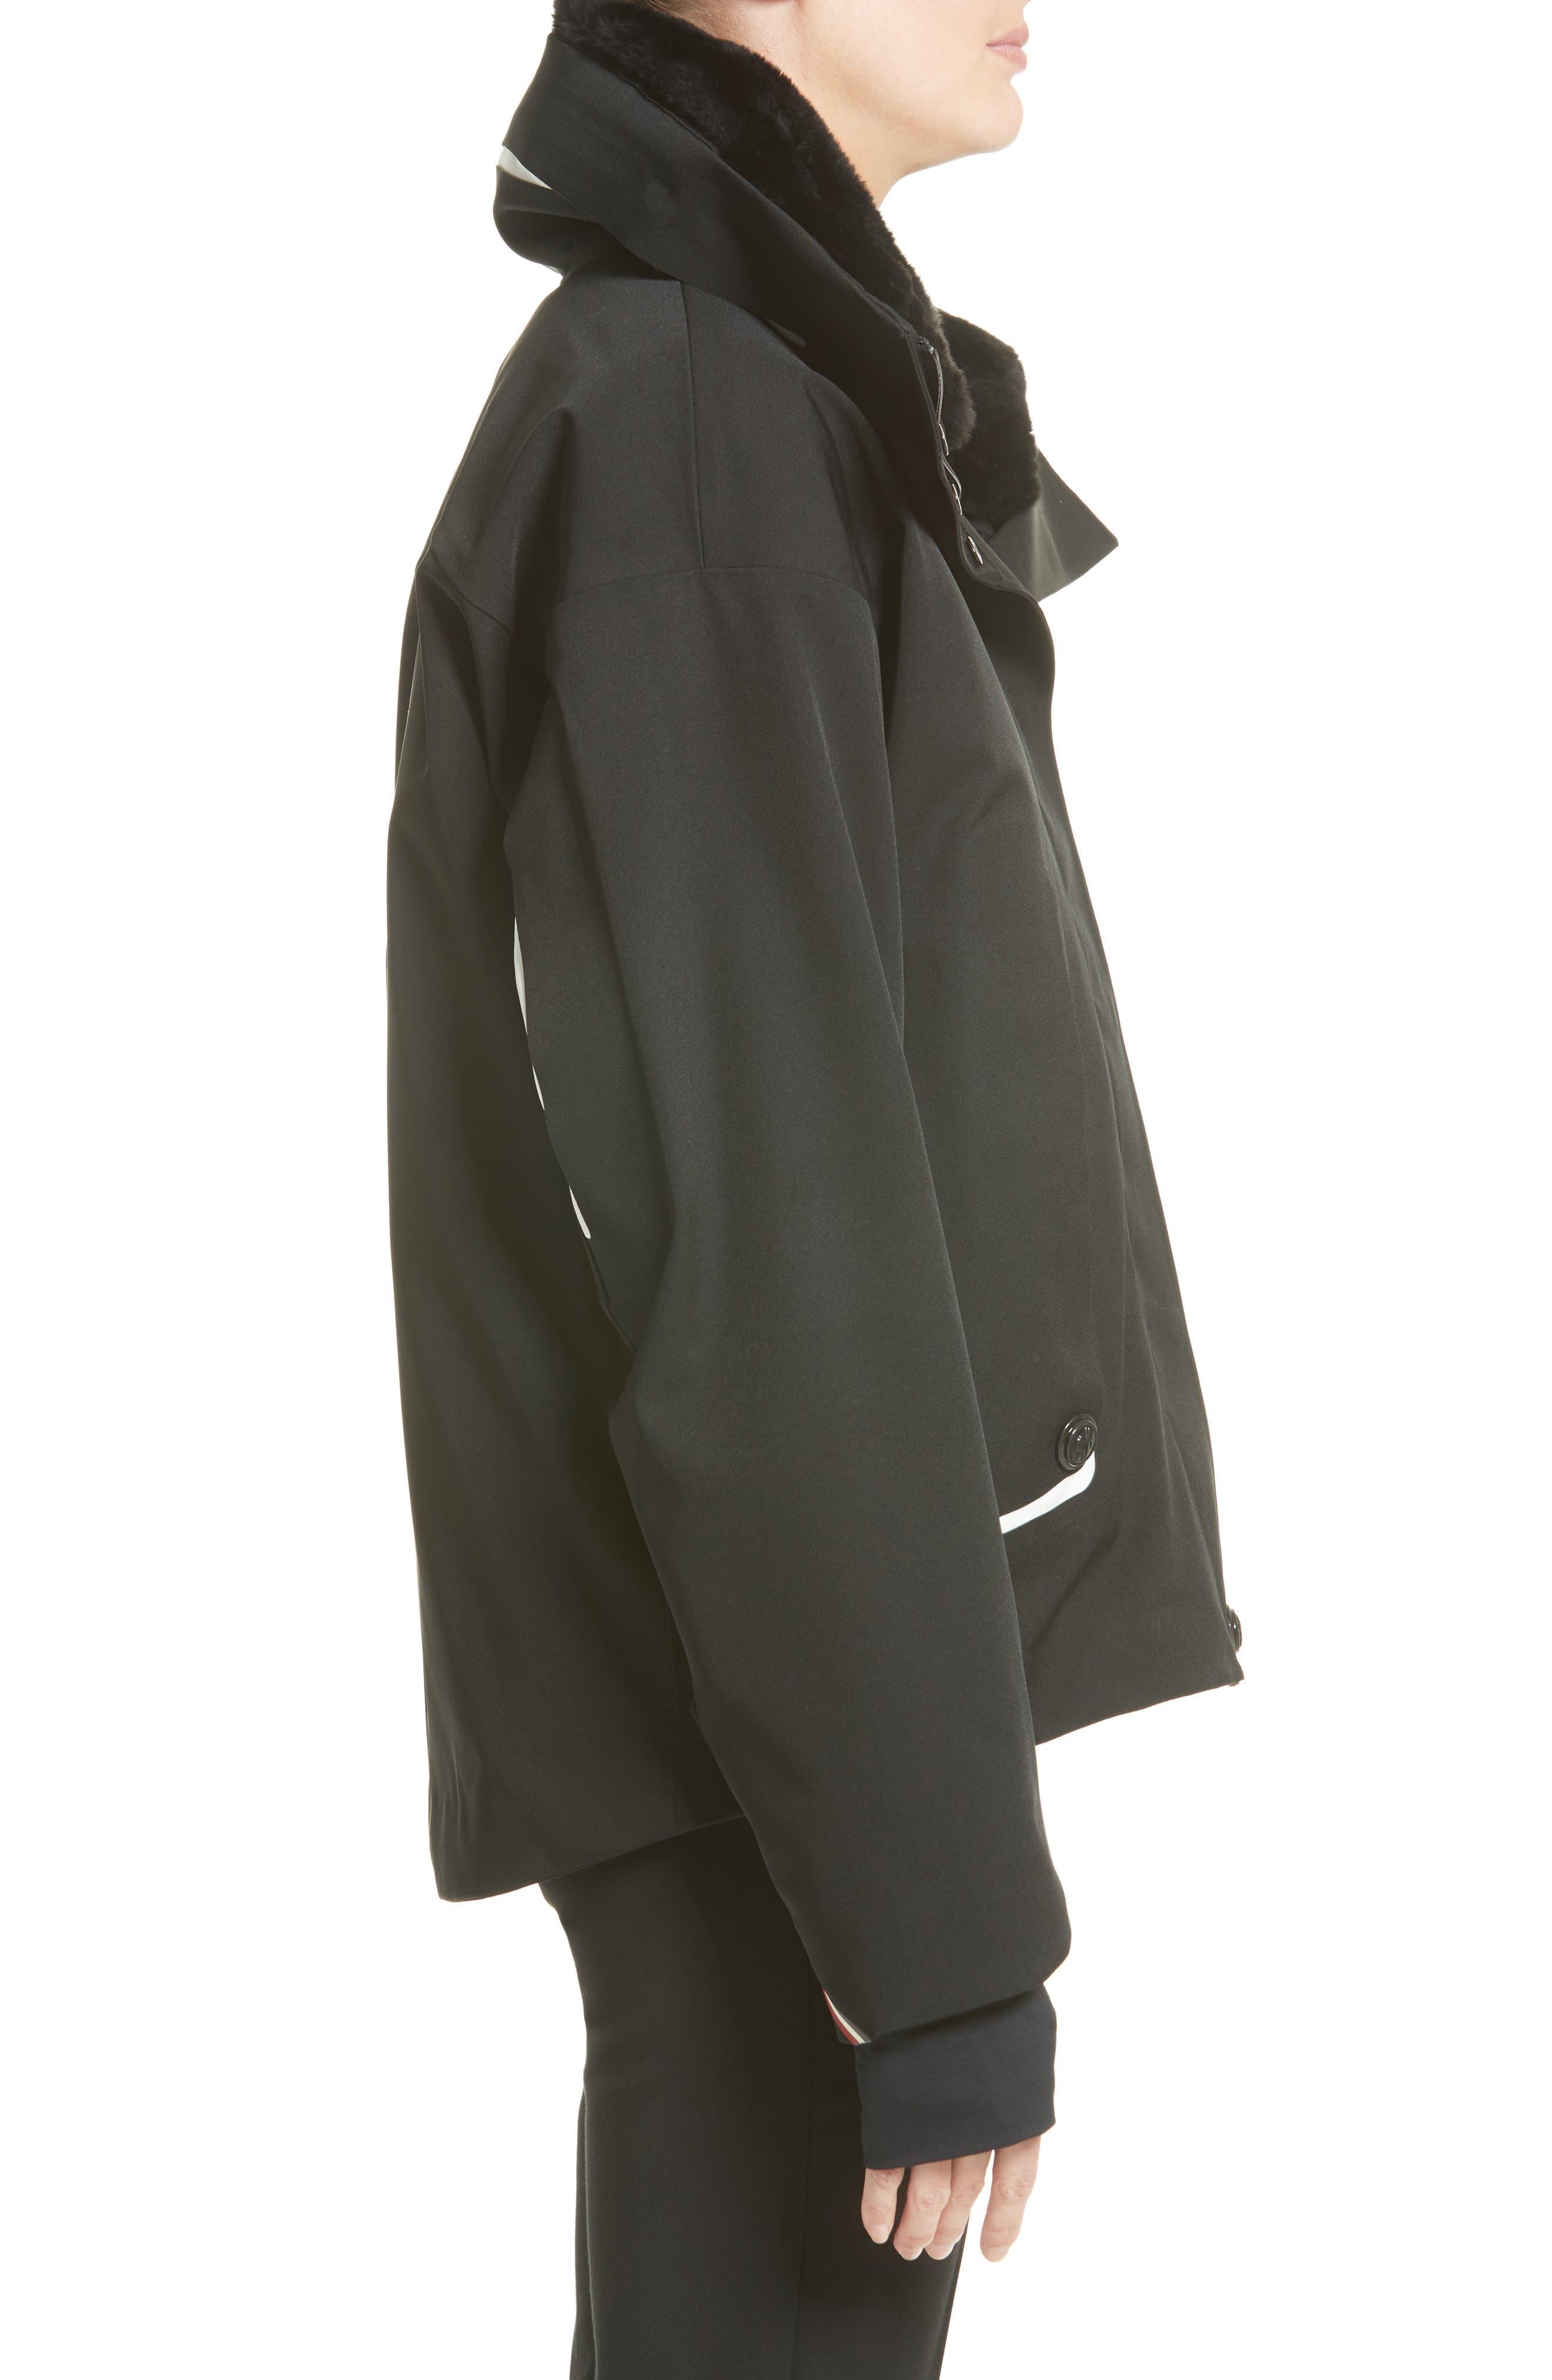 Troisvallees Jacket with Genuine Nutria Fur Collar,                             Alternate thumbnail 3, color,                             Black/ White